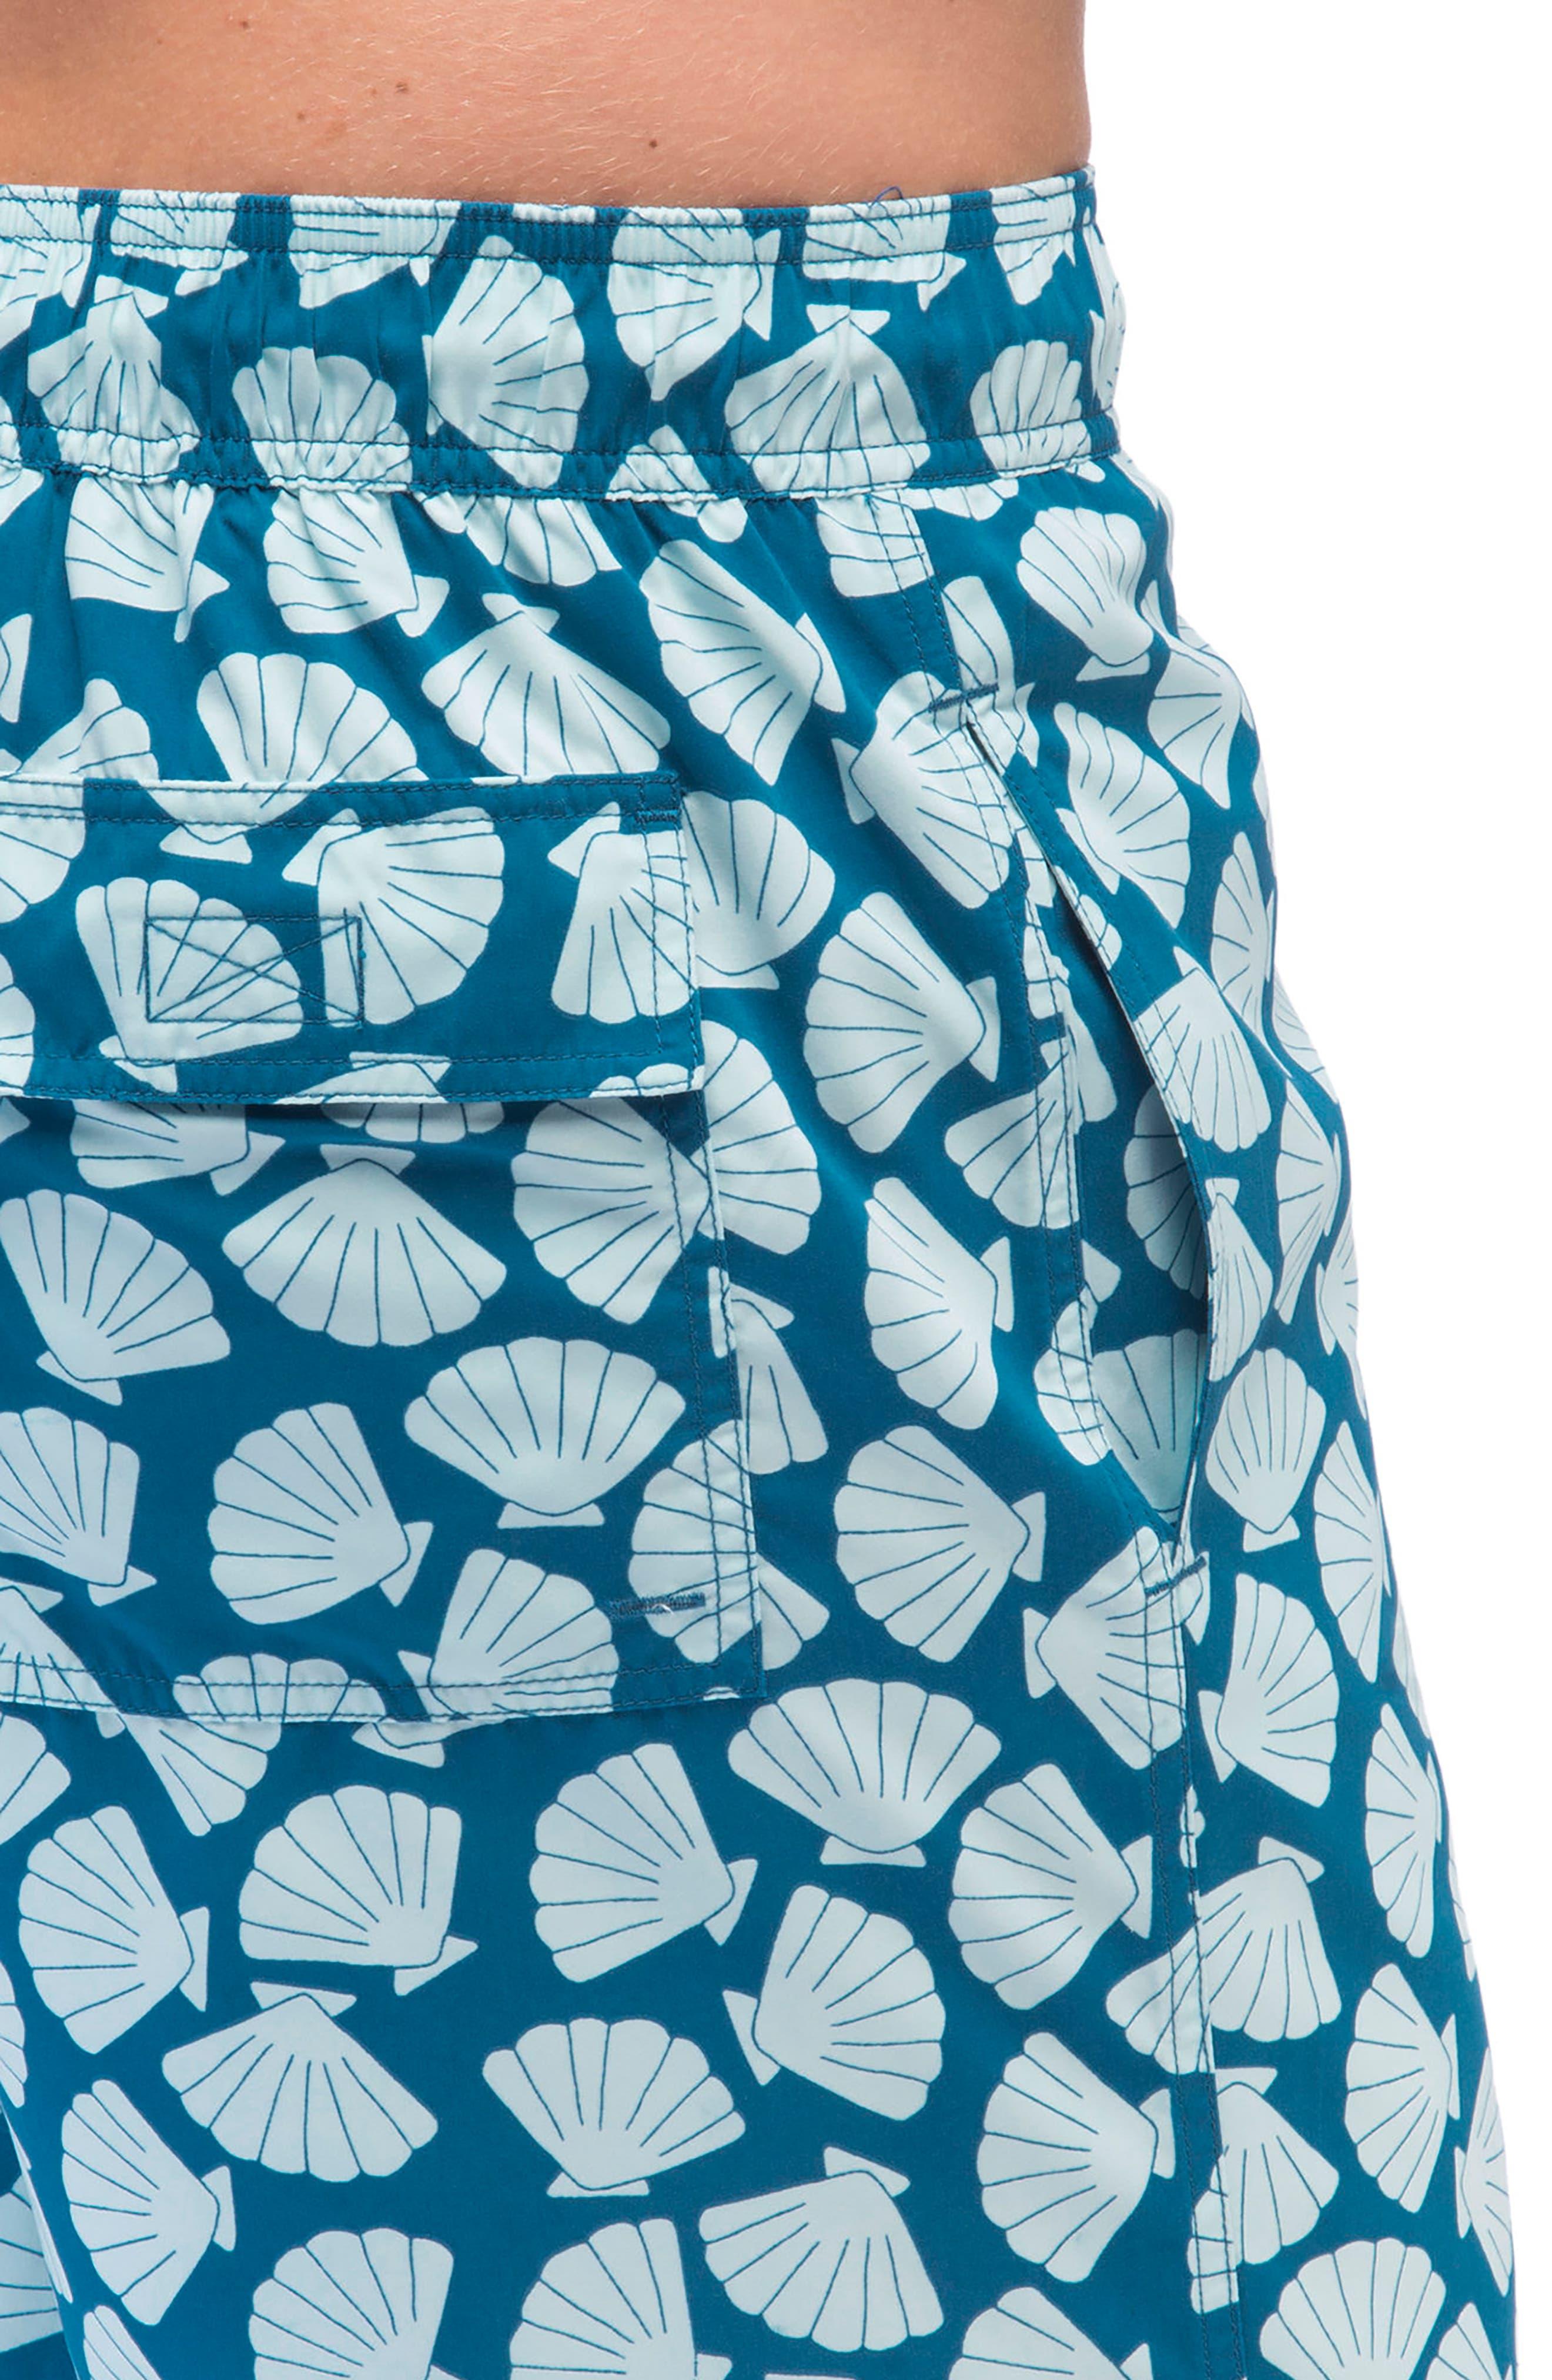 Shell Print Swim Trunks,                             Alternate thumbnail 3, color,                             400